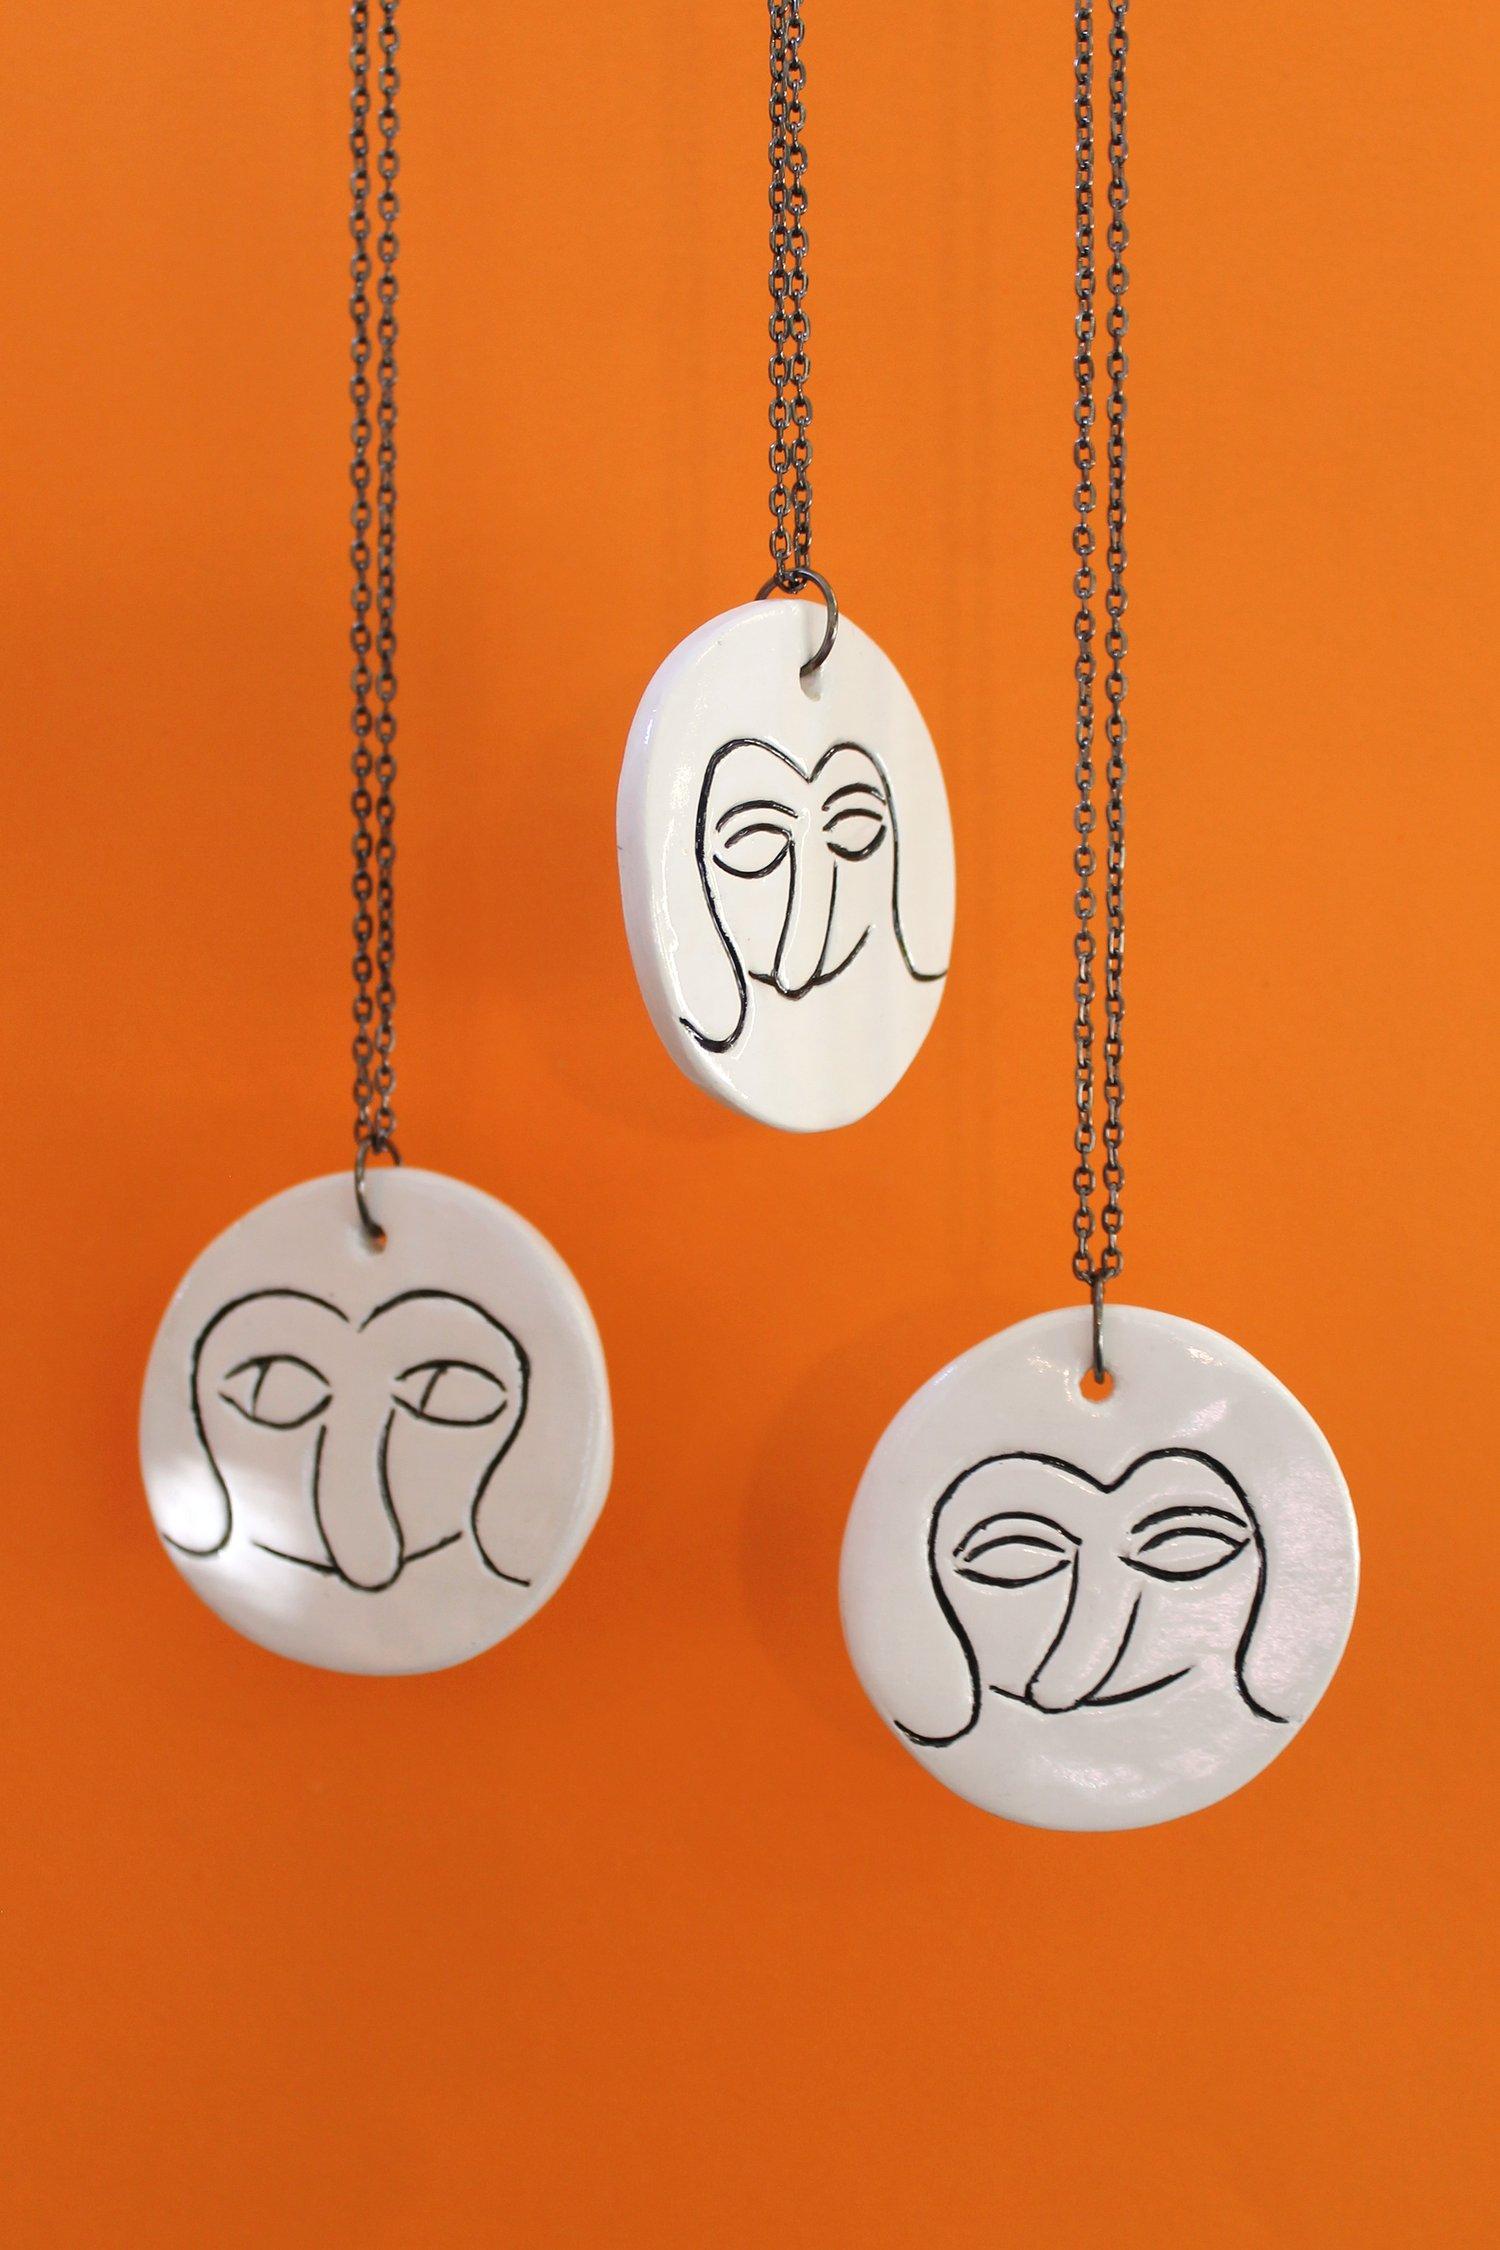 Image of 'Goof Medal' Pendant